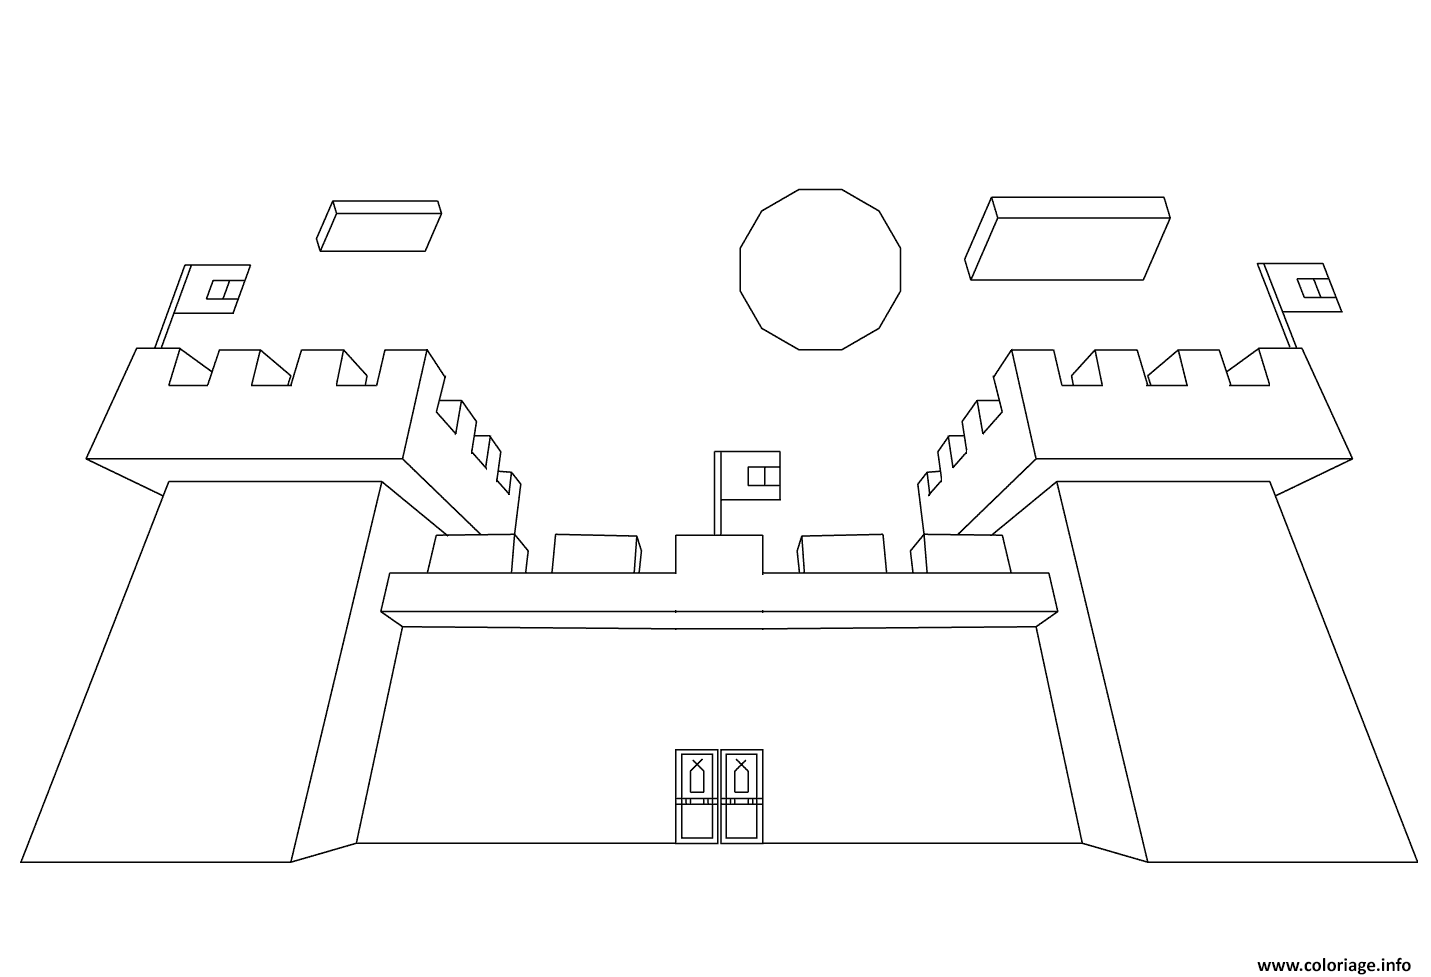 Coloriage Minecraft Chateau dessin